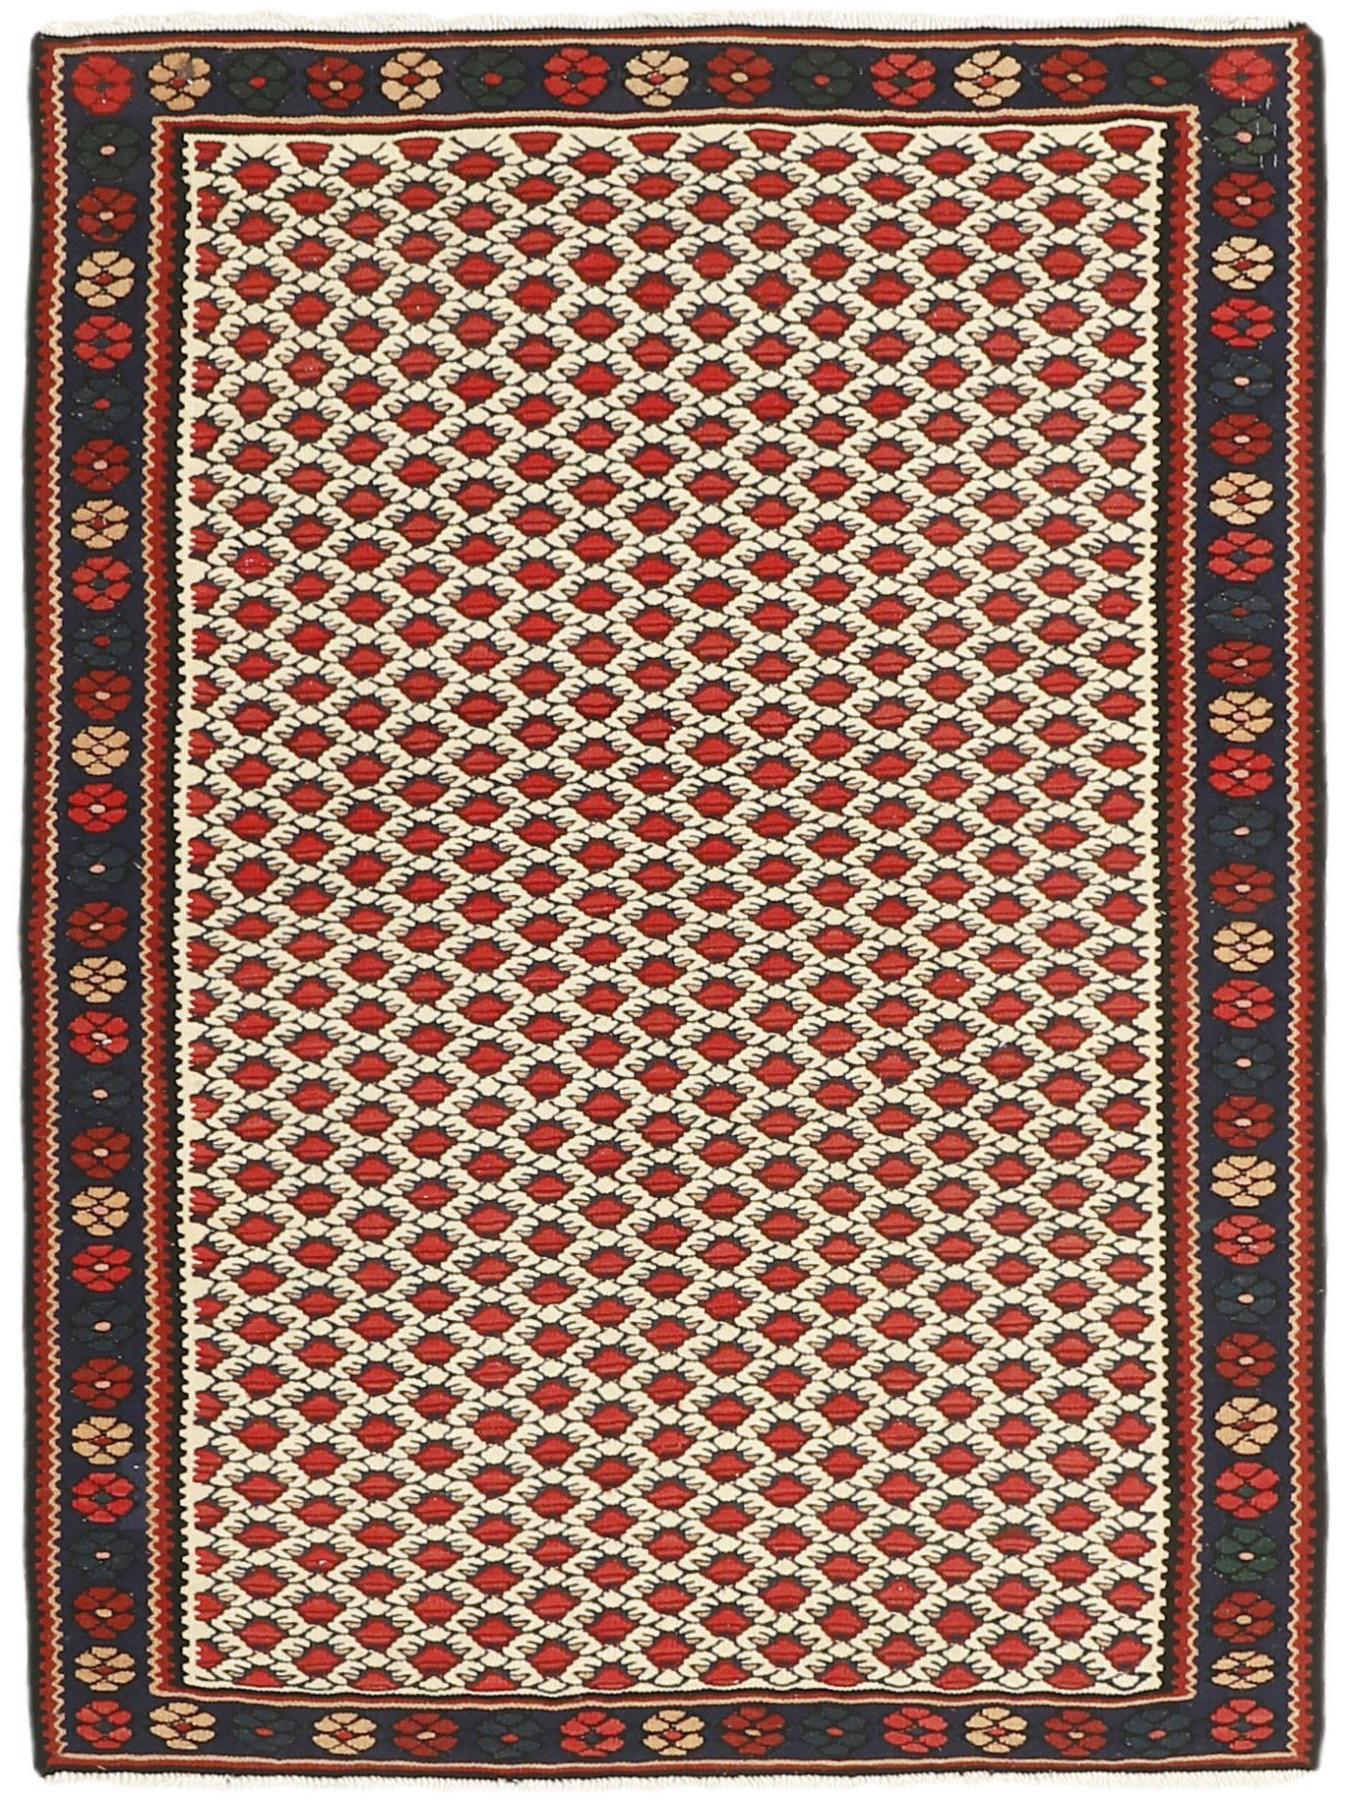 Traditional kilims - Kilim Senneh